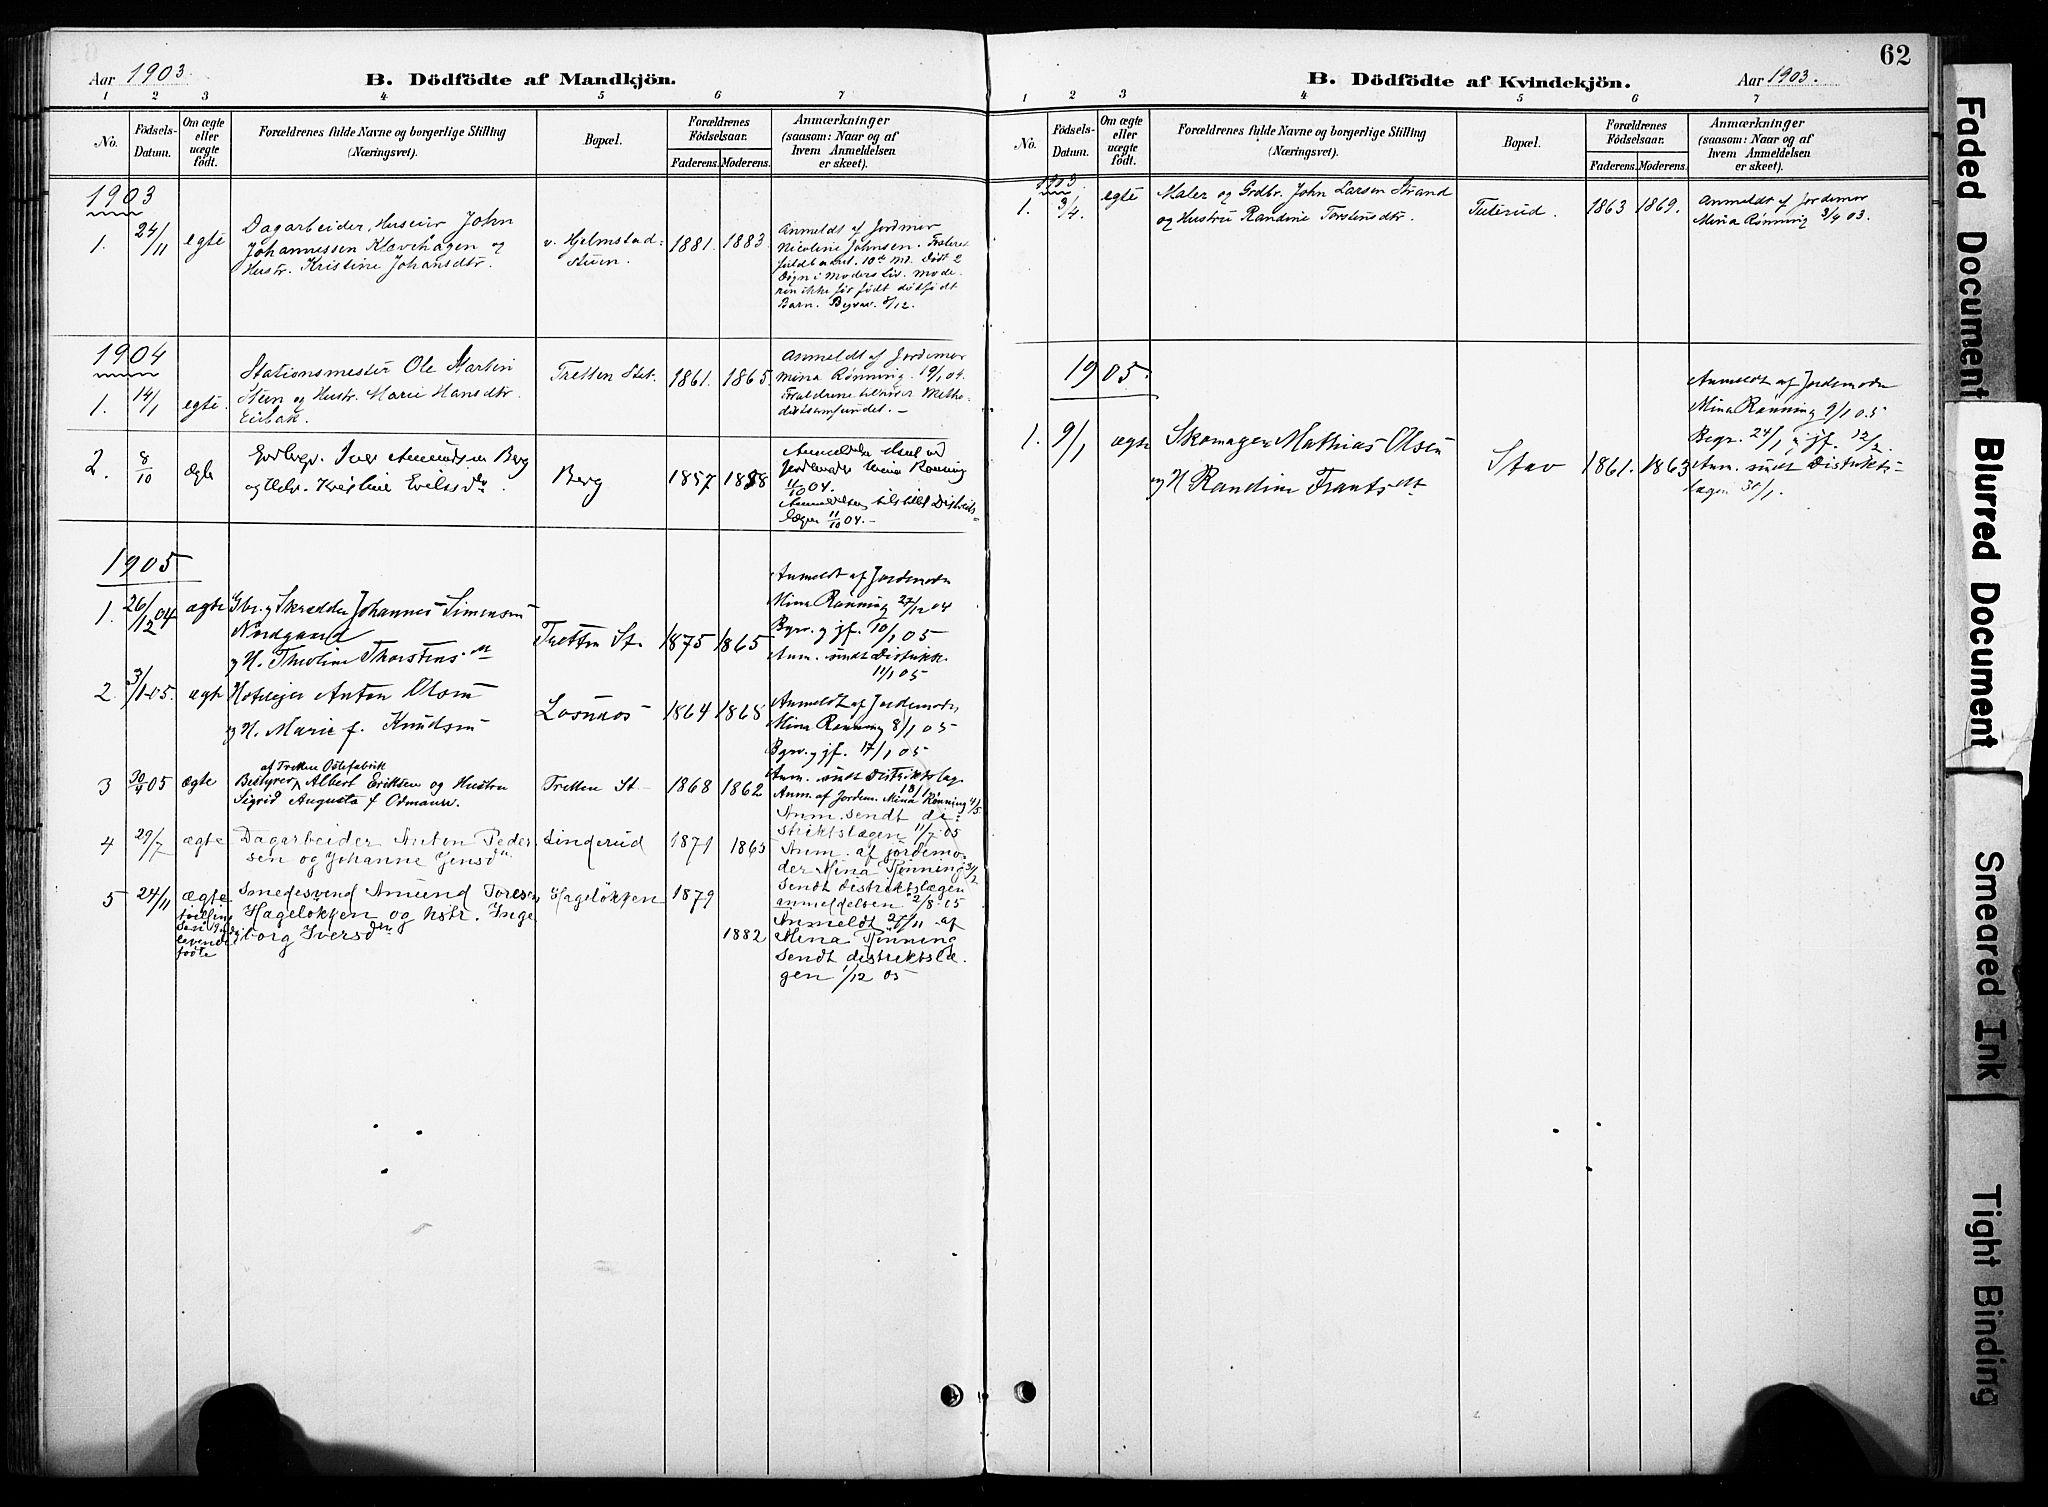 SAH, Øyer prestekontor, Ministerialbok nr. 11, 1894-1905, s. 62